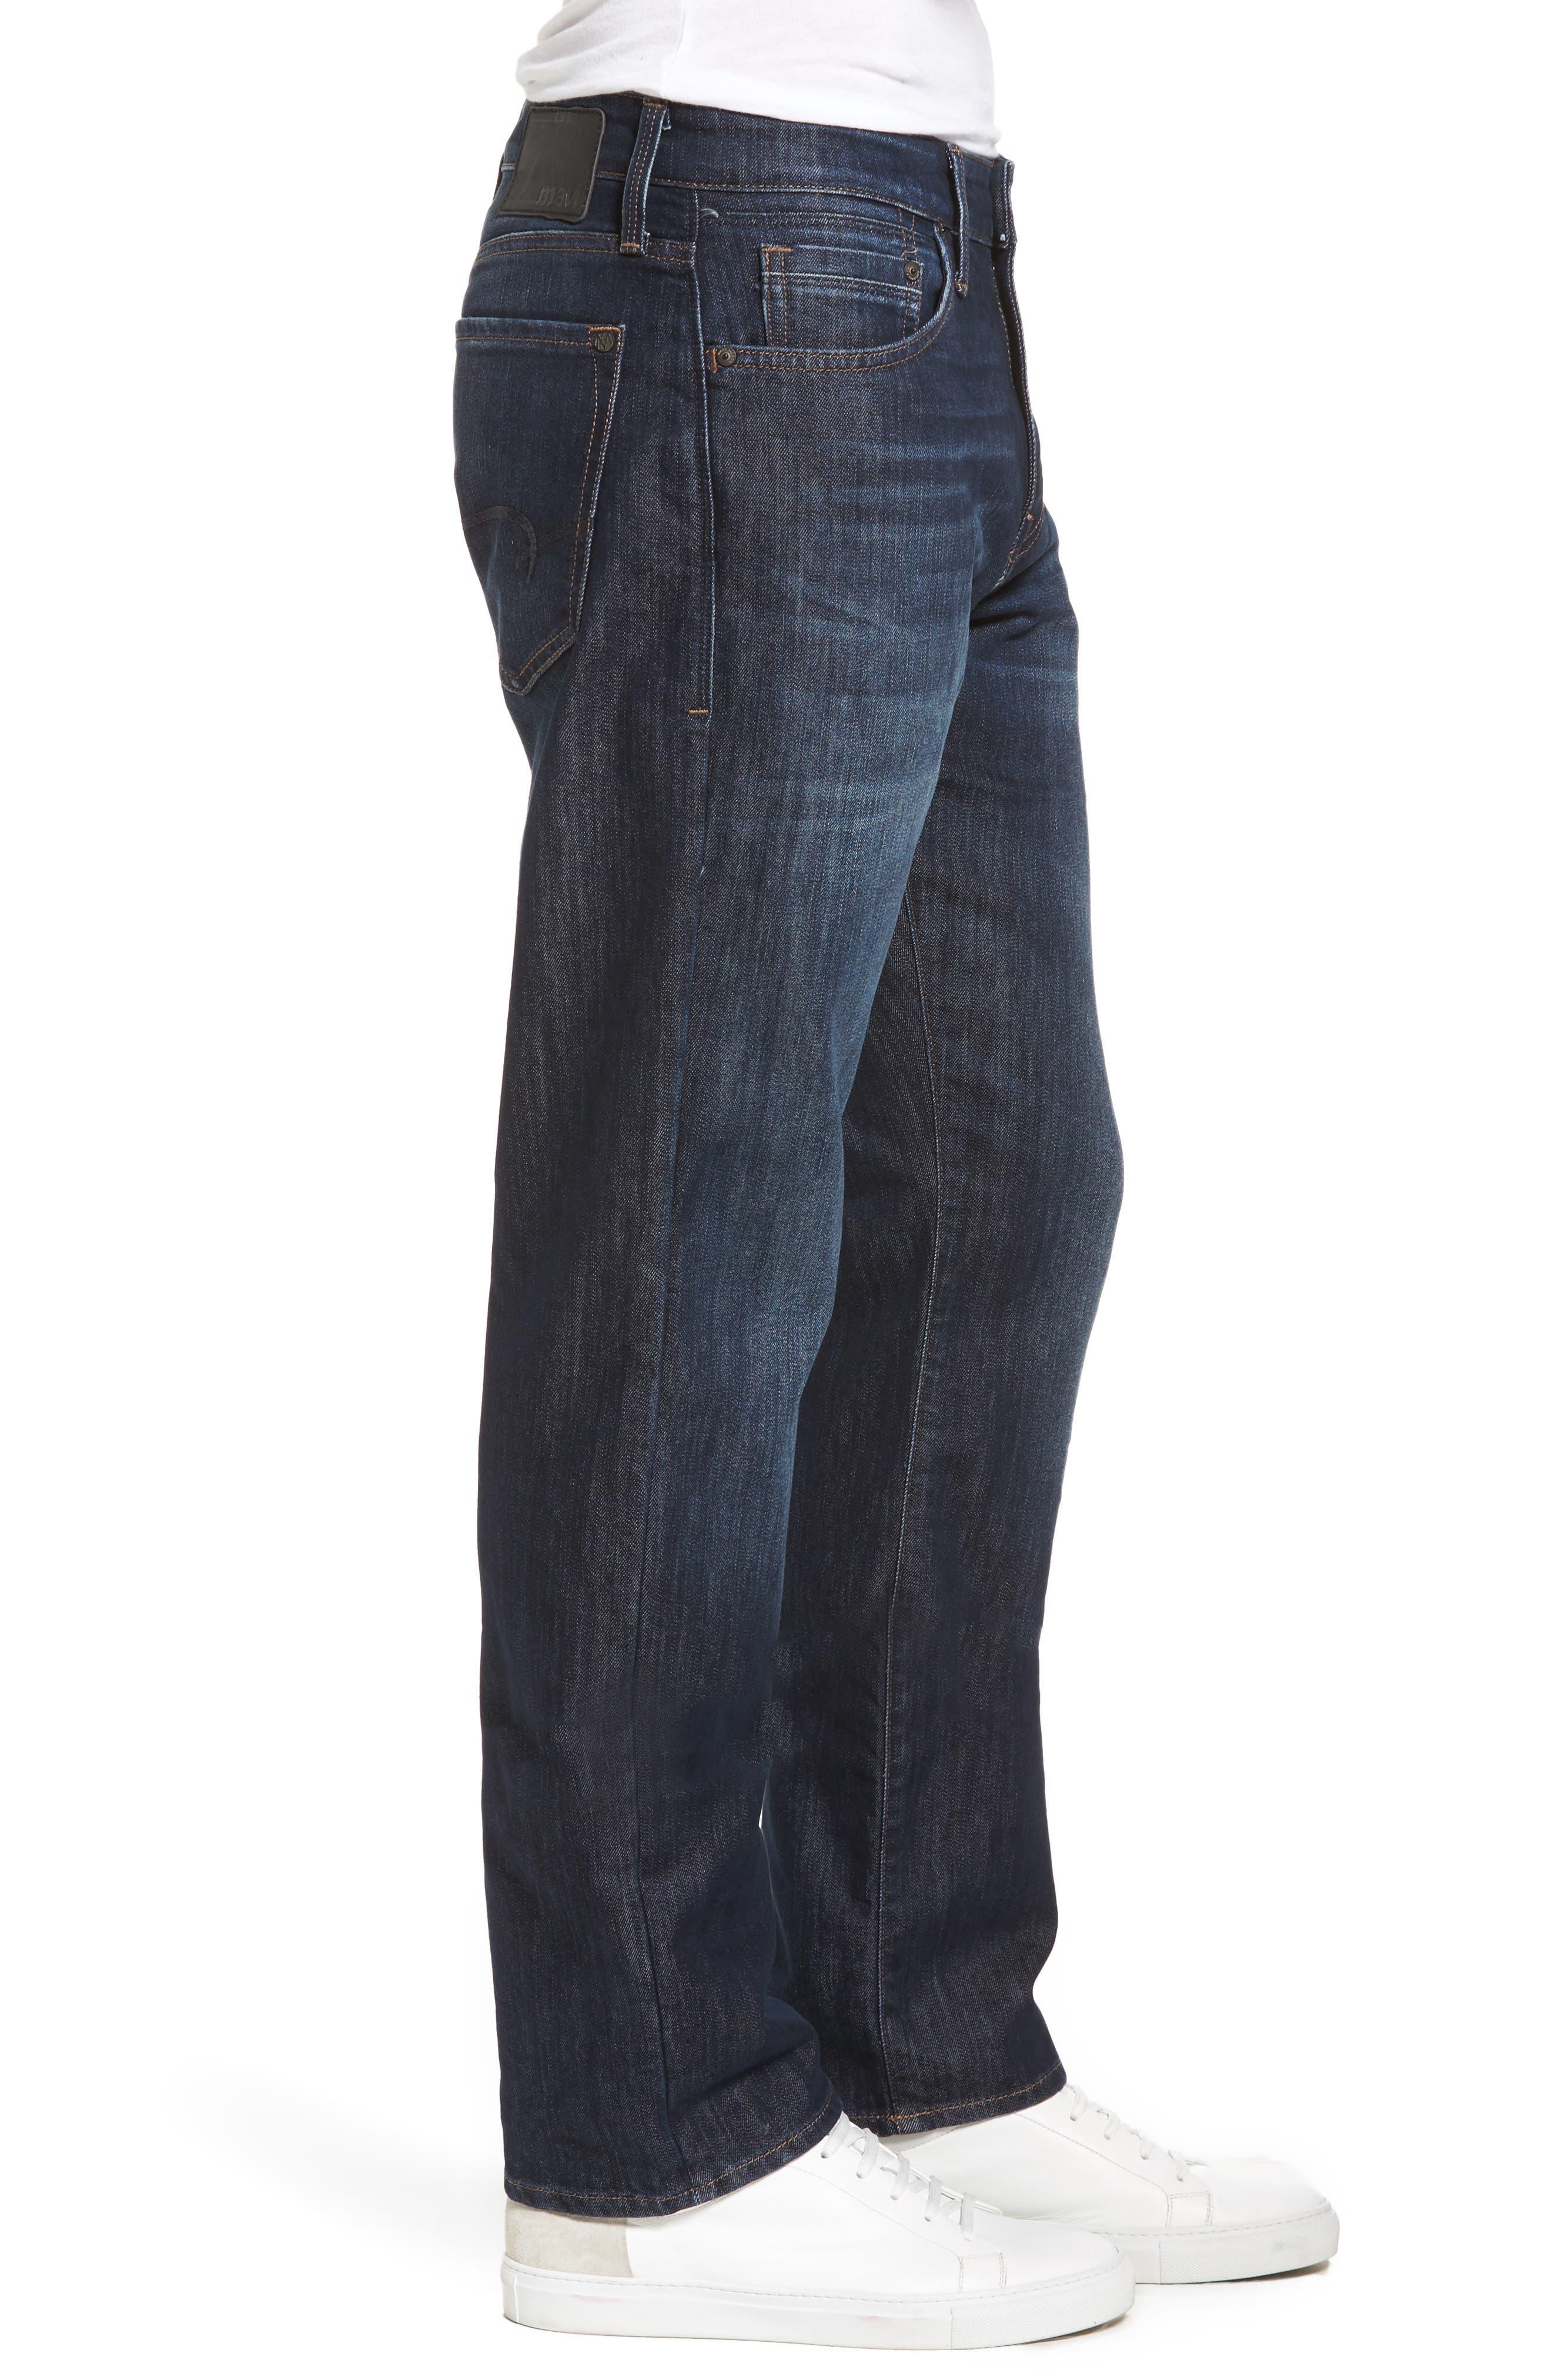 Matt Relaxed Fit Jeans,                             Alternate thumbnail 3, color,                             DARK STANFORD